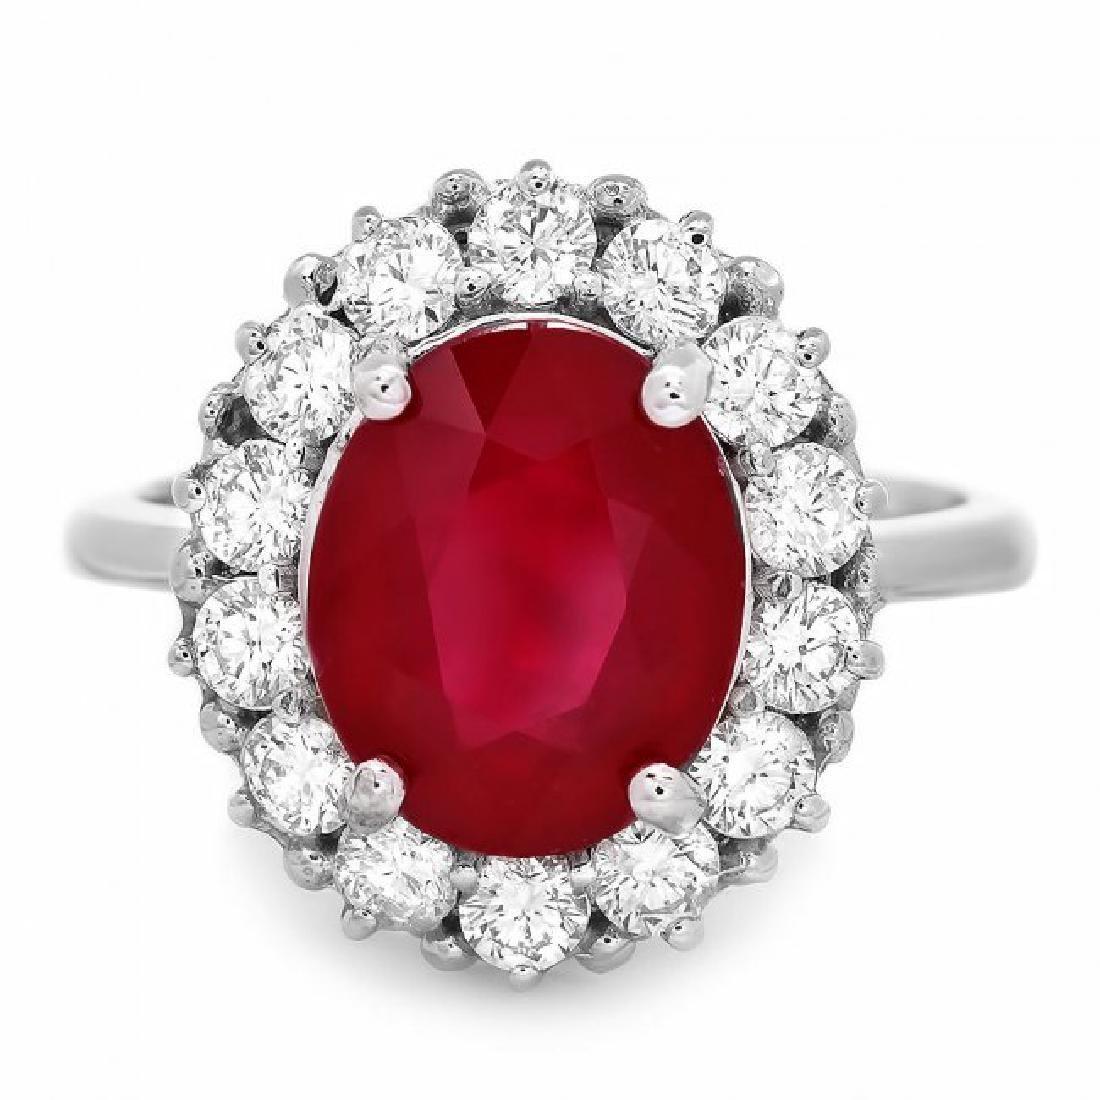 14k White Gold 5.00ct Ruby 1.00ct Diamond Ring - 2